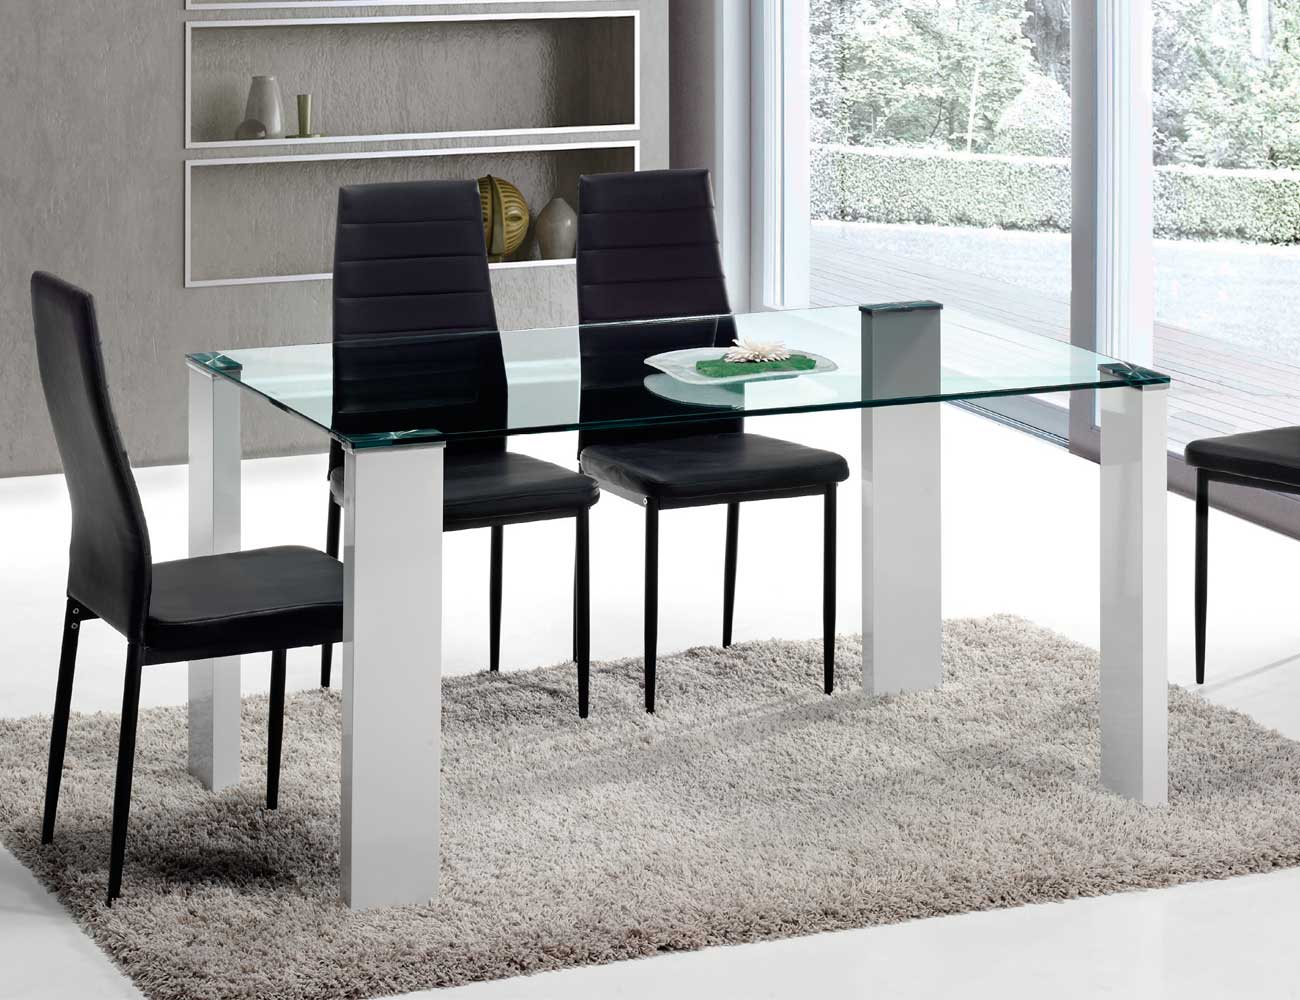 Mesa de comedor de cristal templado de 150 cm de ancho - Mesa cristal templado ...